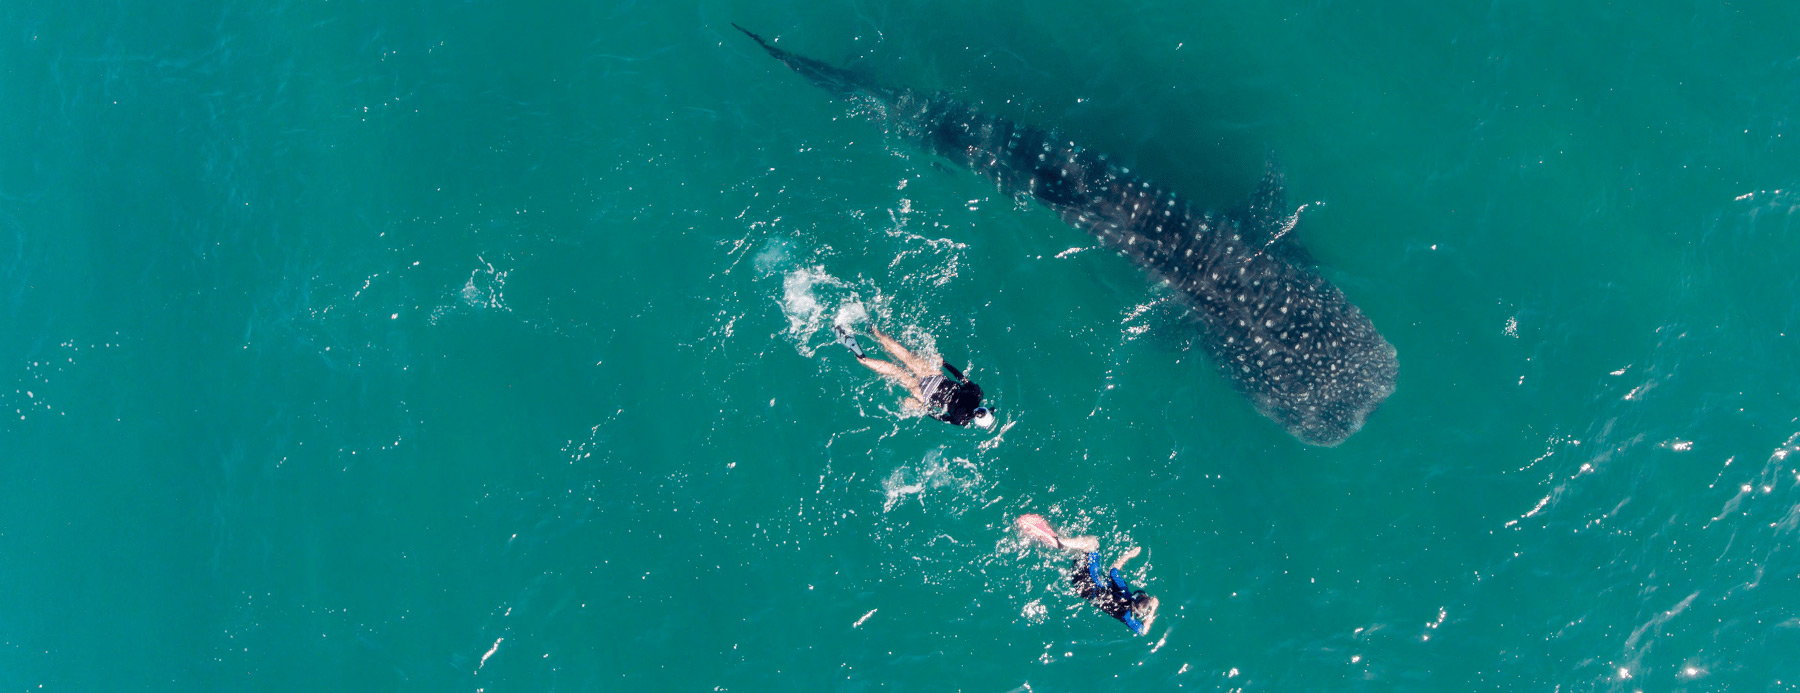 Requin-baleine de la mer de cortez bahia